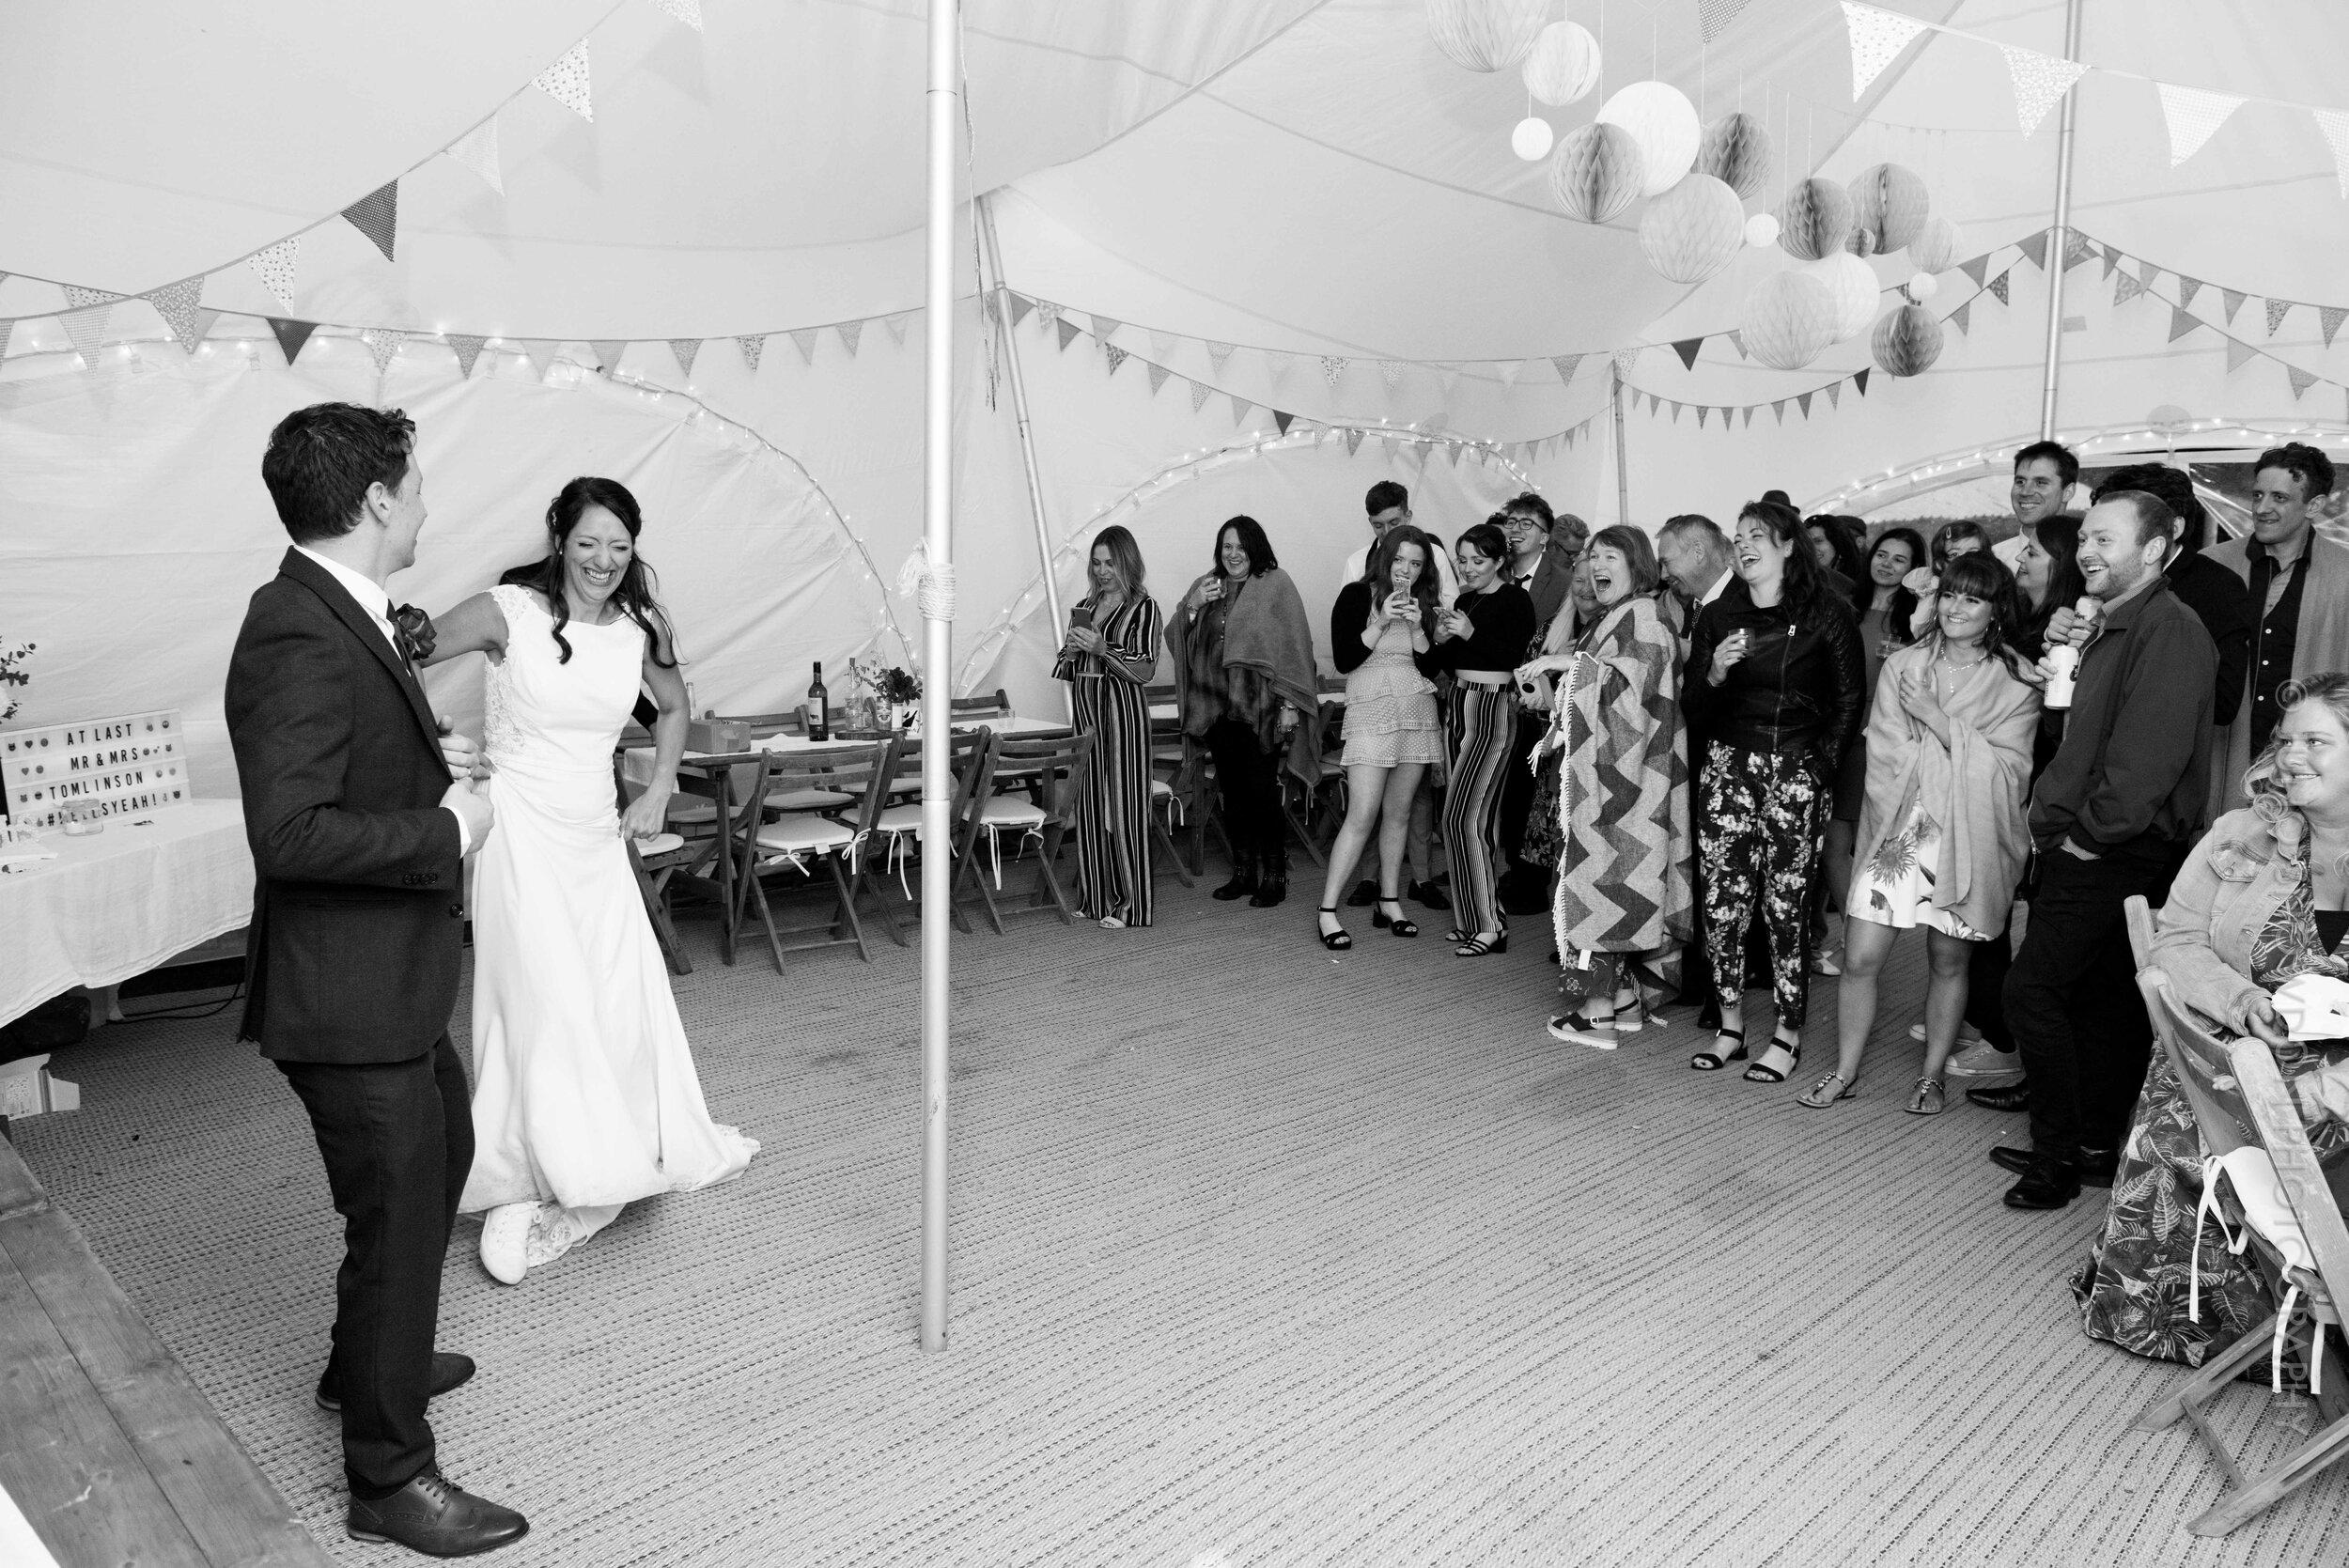 juno-snowdon-photography-wedding-8411.jpg